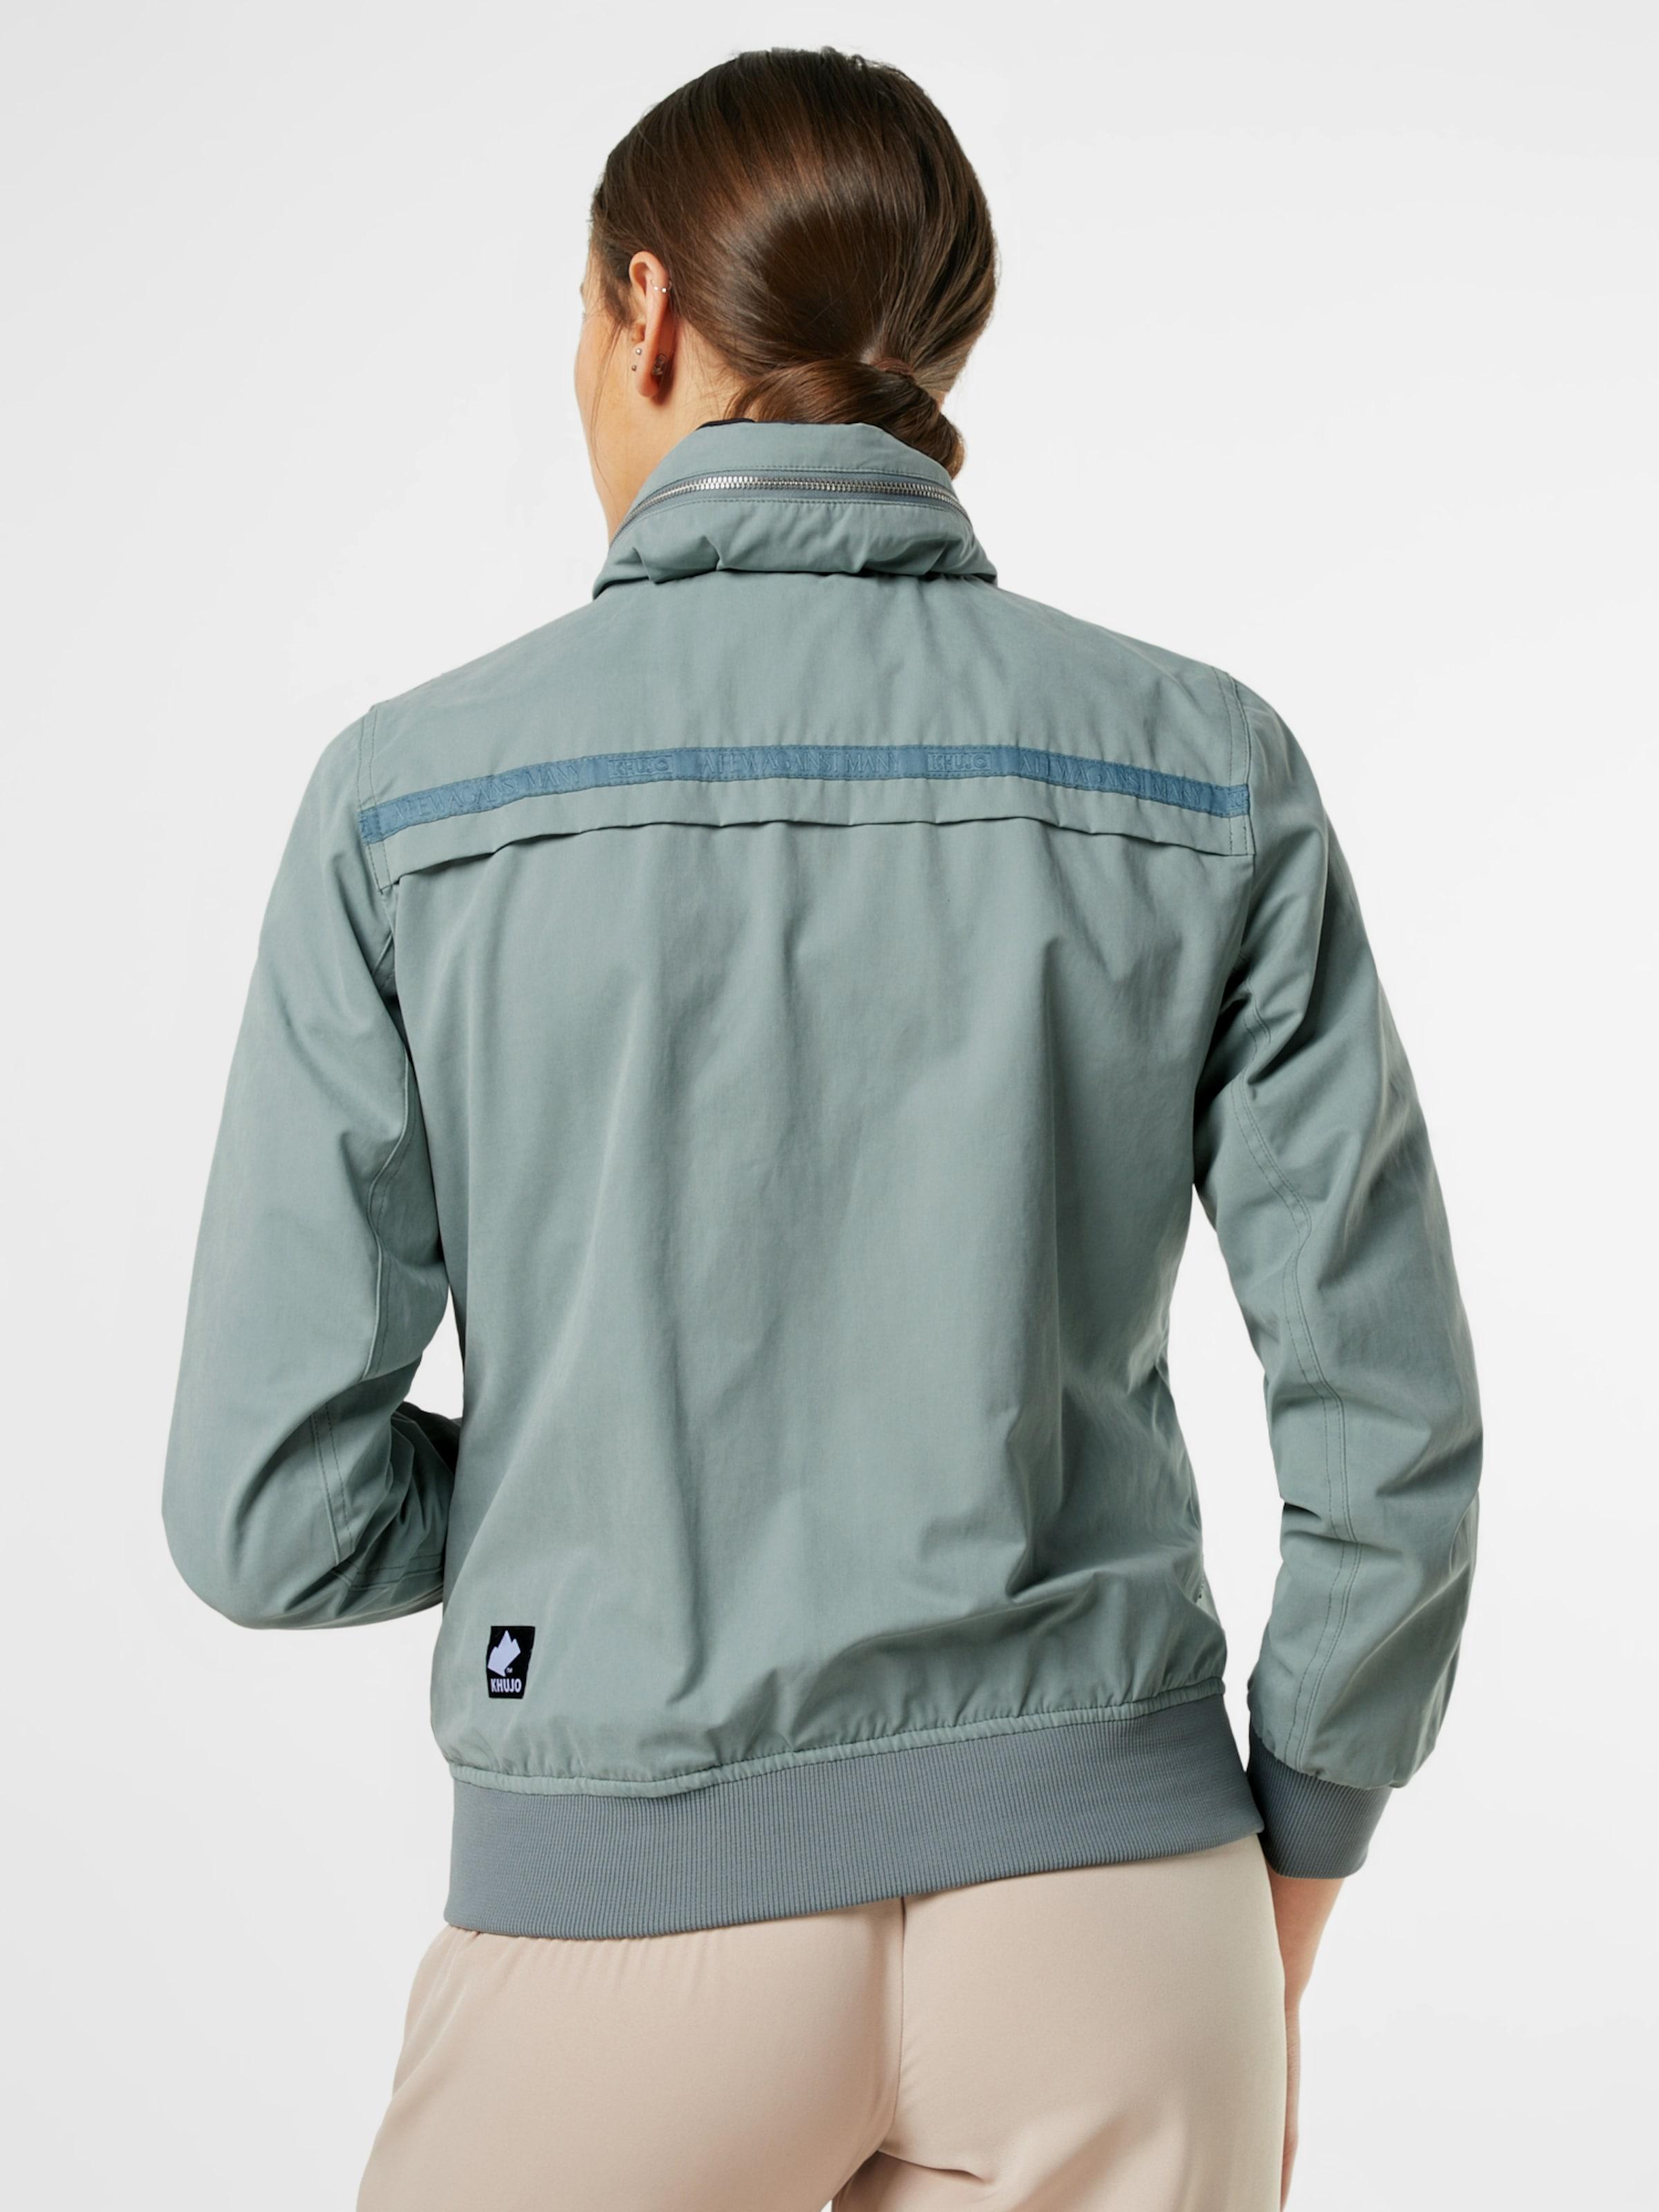 khujo Casual Jacke Sehr Billig Verkauf Online Yz6H6L